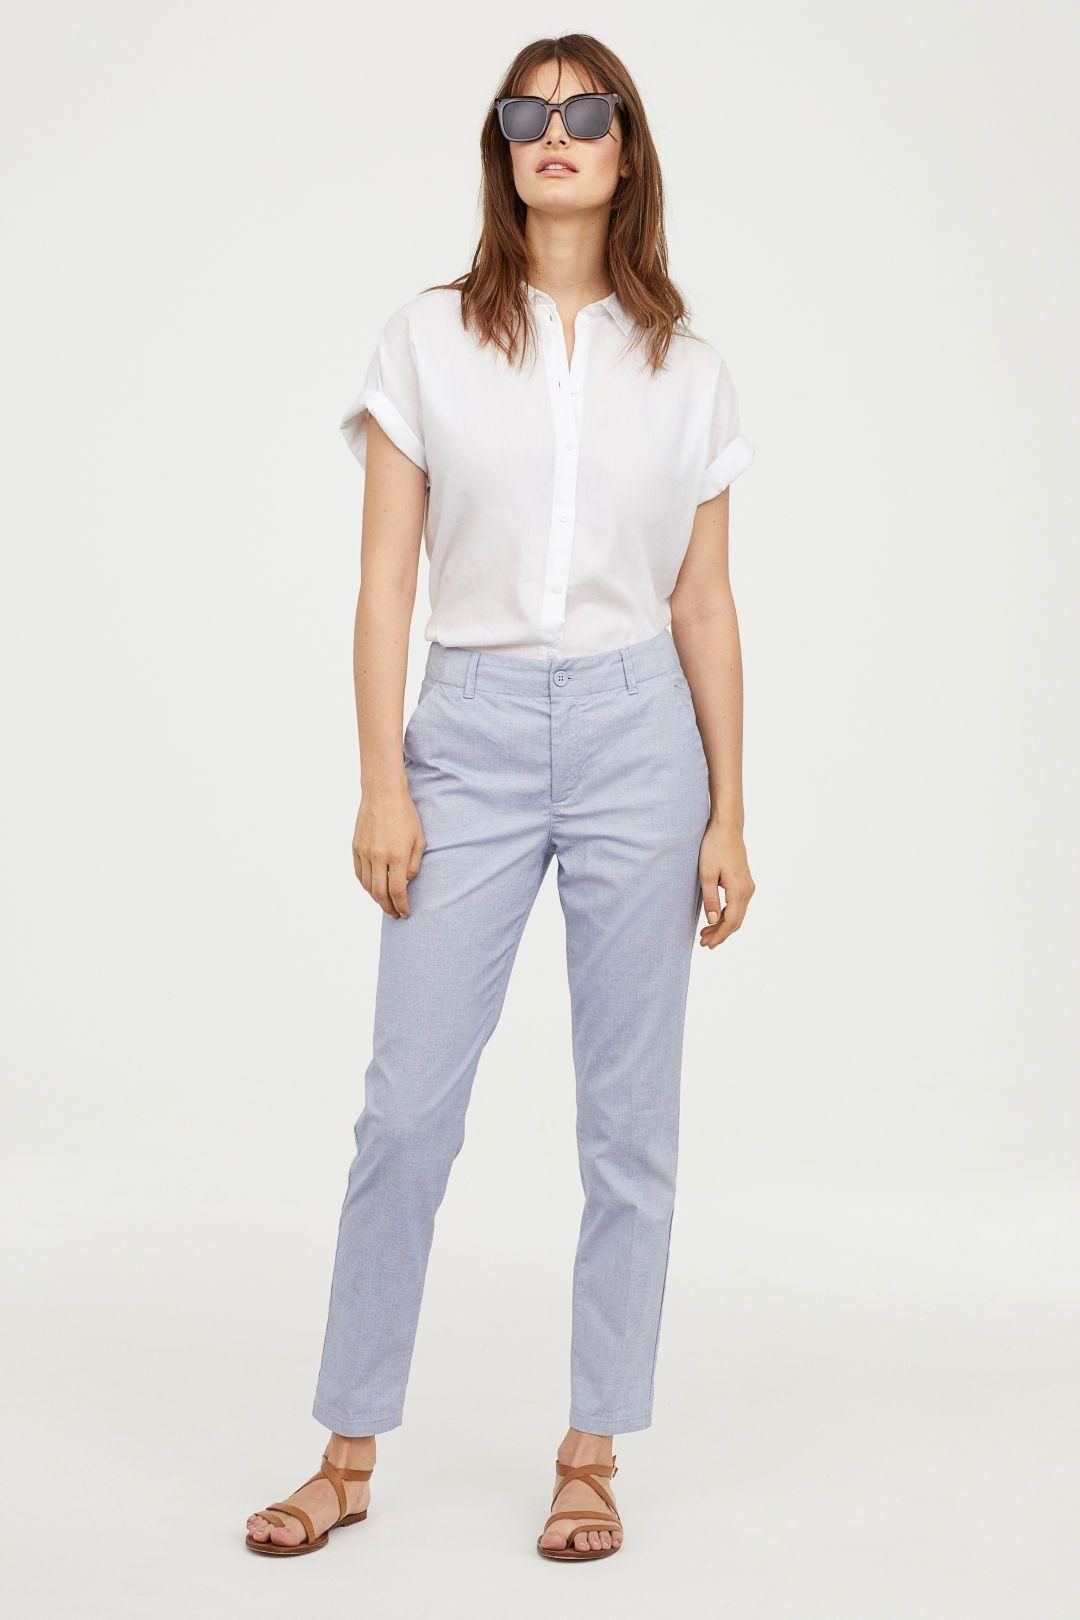 Cotton Chinos Dark Blue Ladies H M Us Chinos Women Outfit Chino Pants Women Khaki Pants Outfit Women